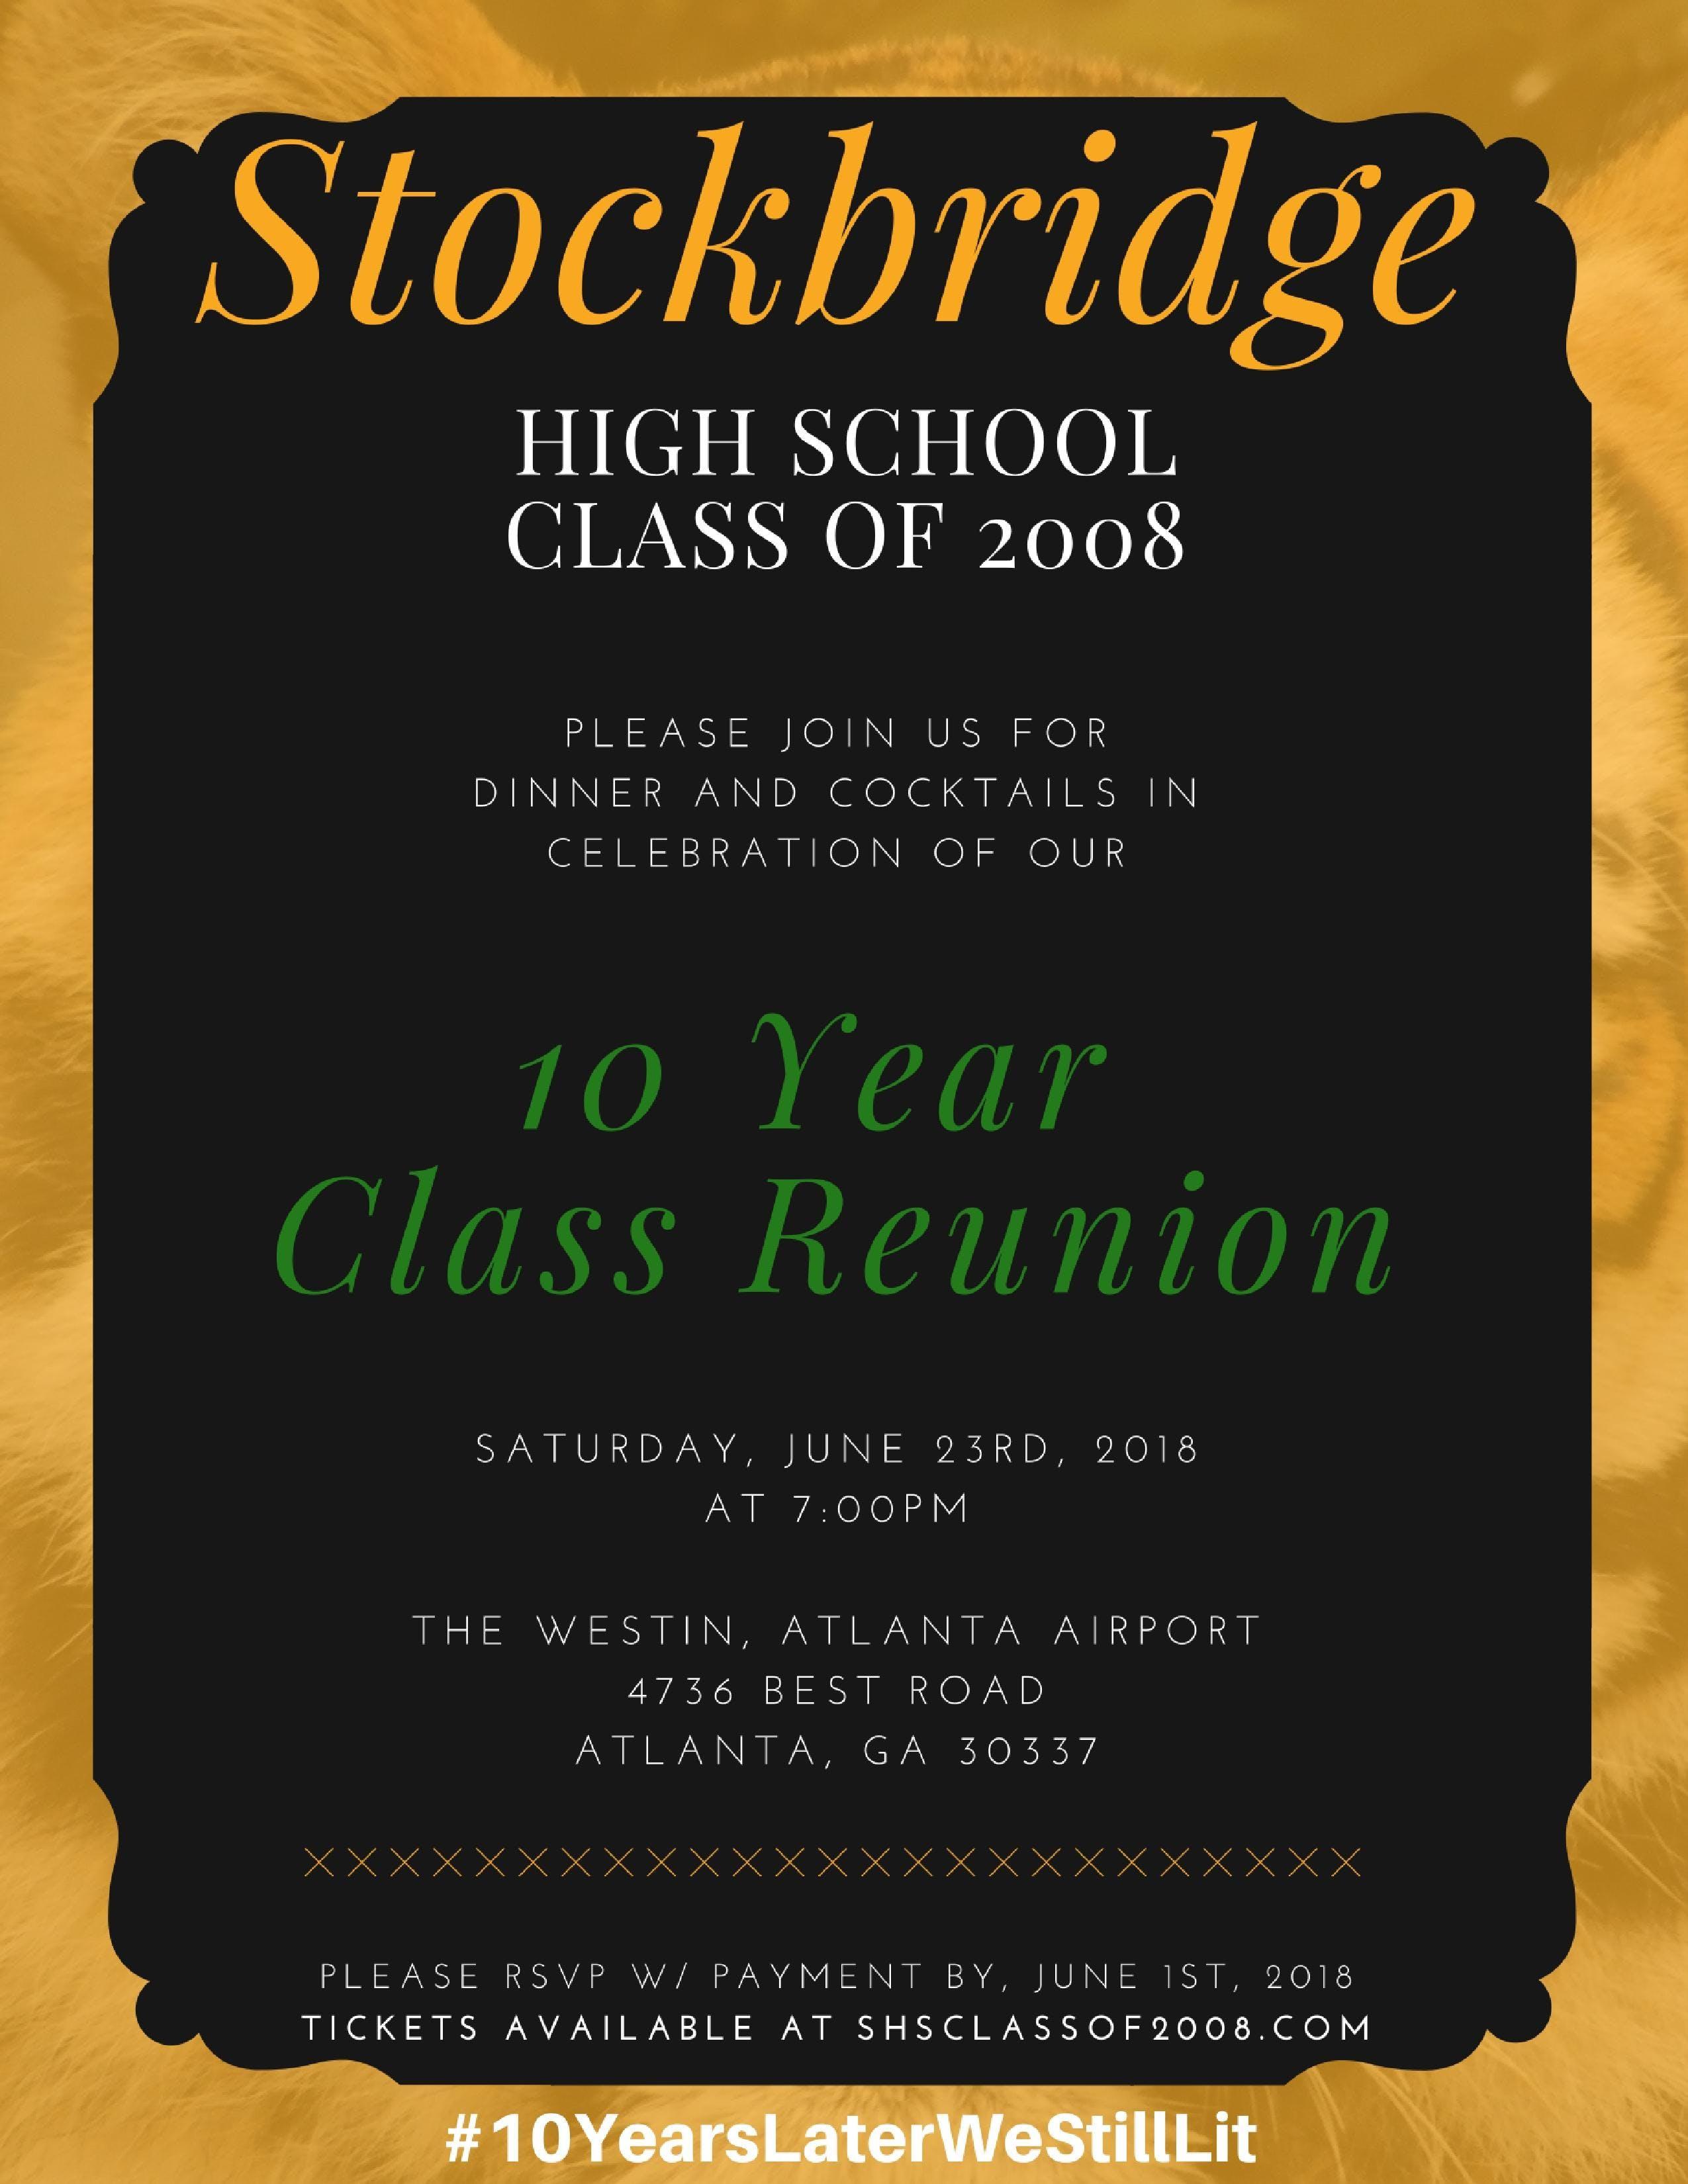 SHS Class of 2008, 10 Year Reunion